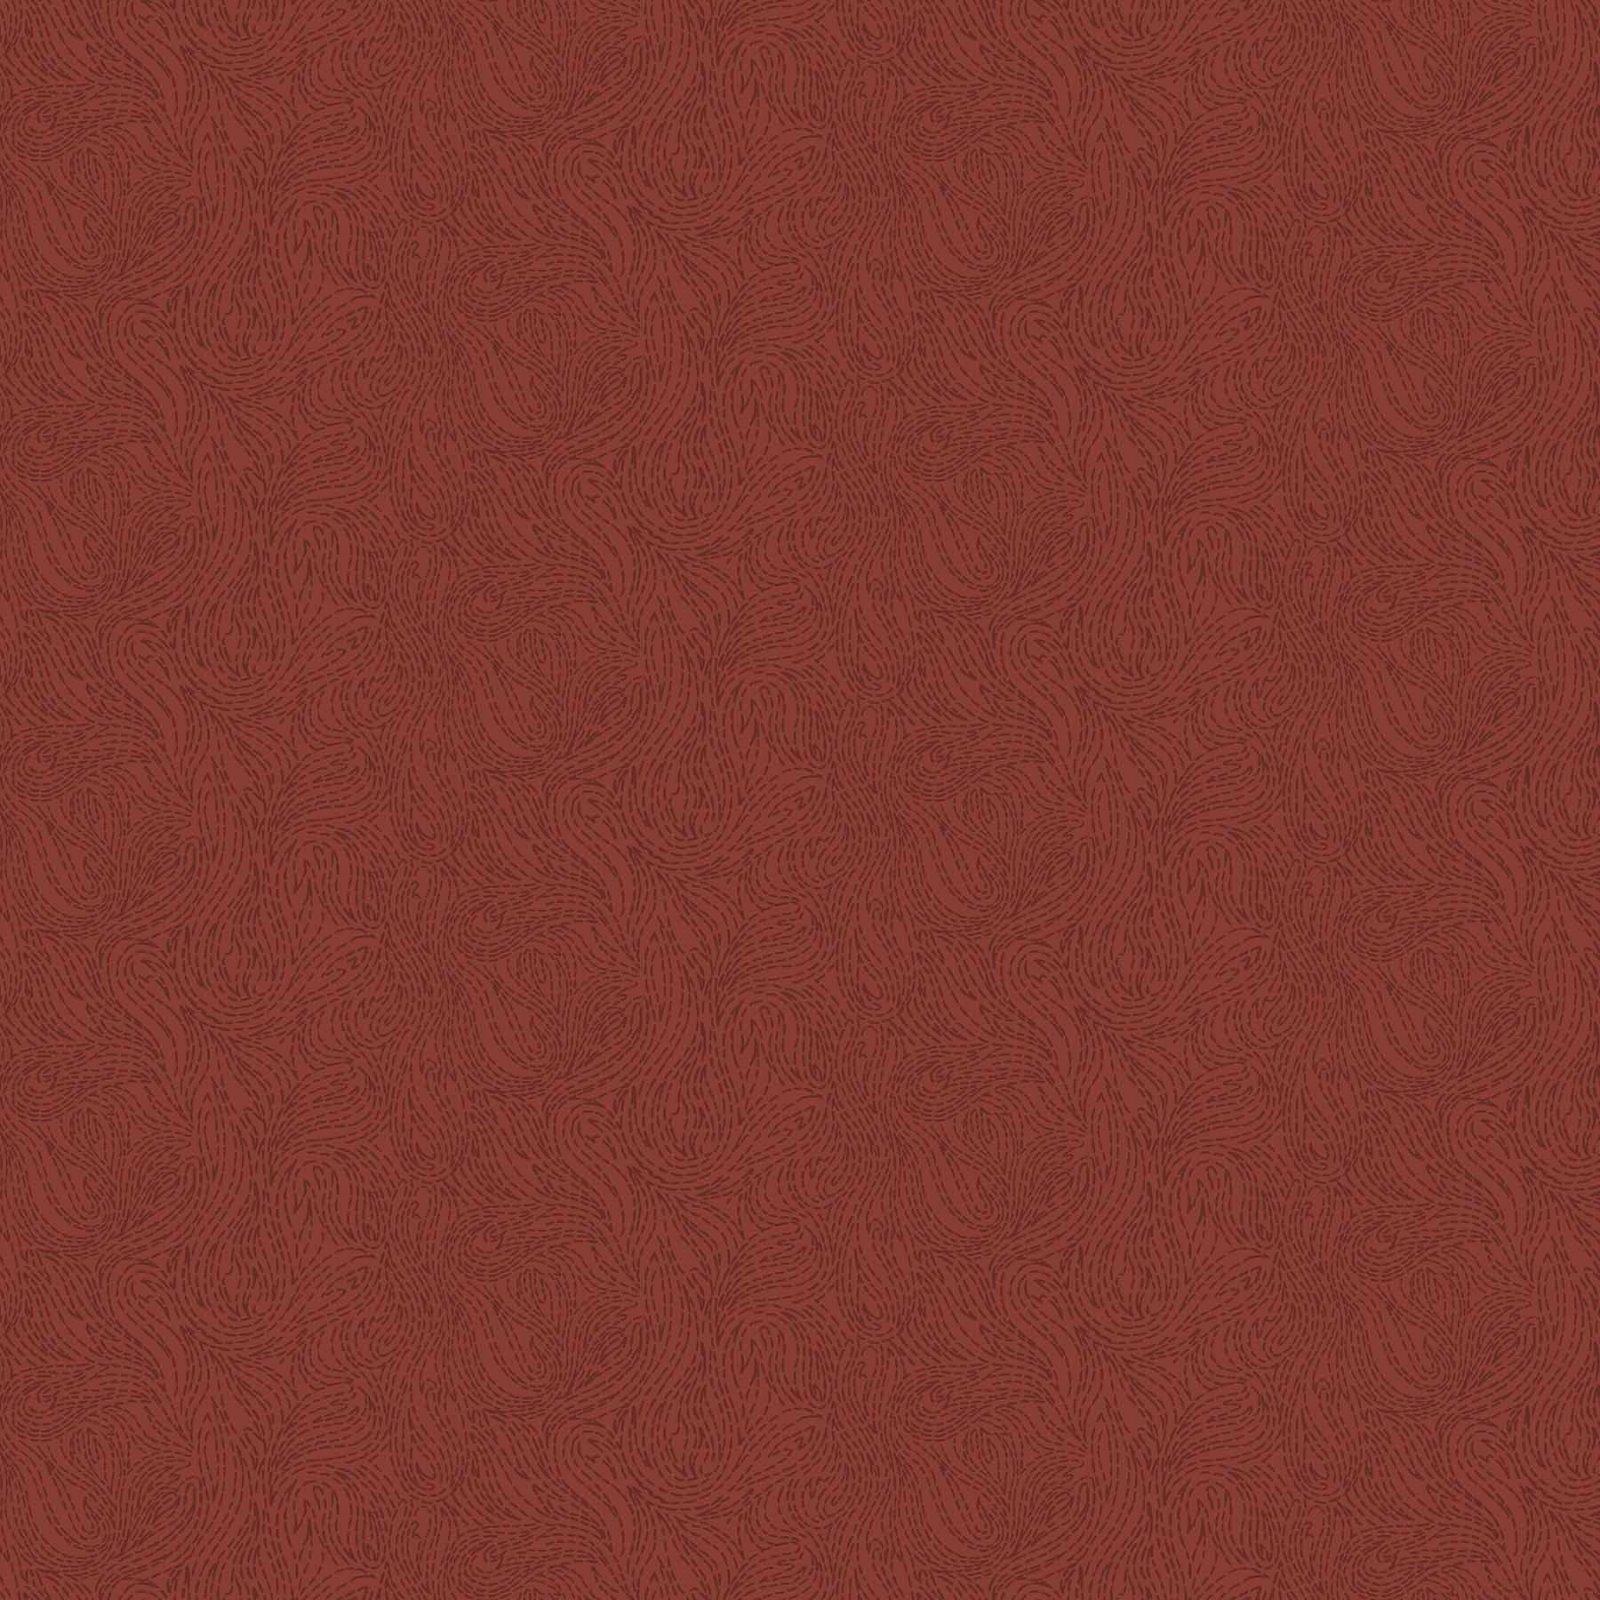 Brown - Fire - FIGO Elements - 92009 36